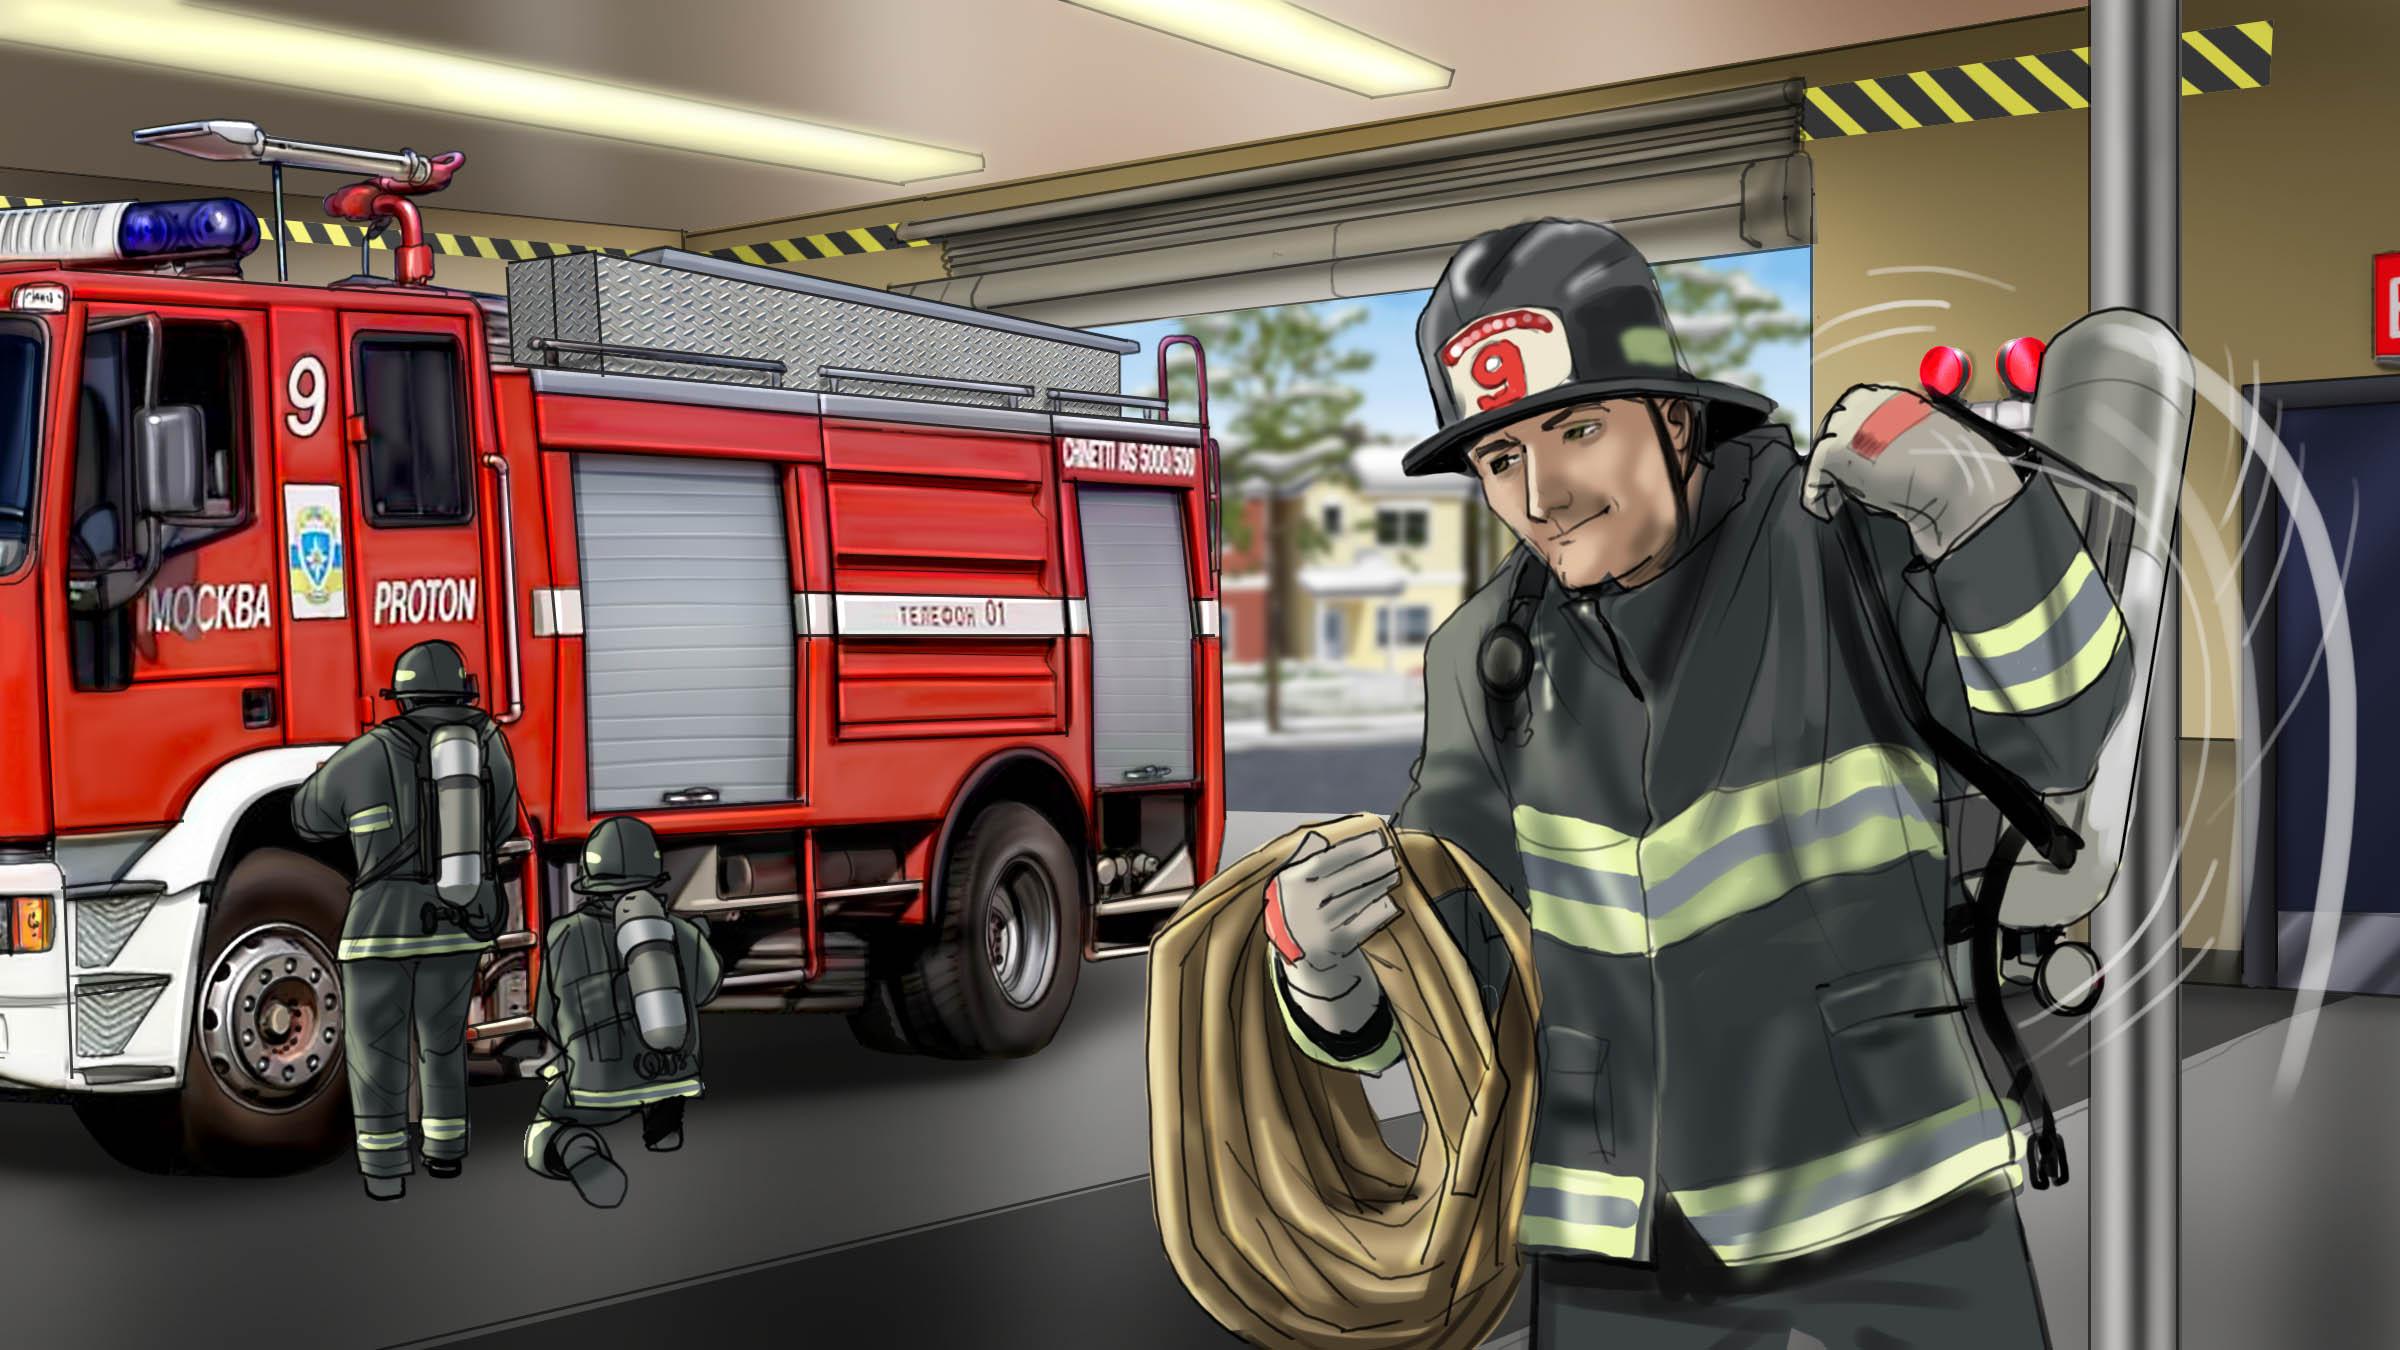 Theraflu_firefighter_ru_05_bkg.jpg